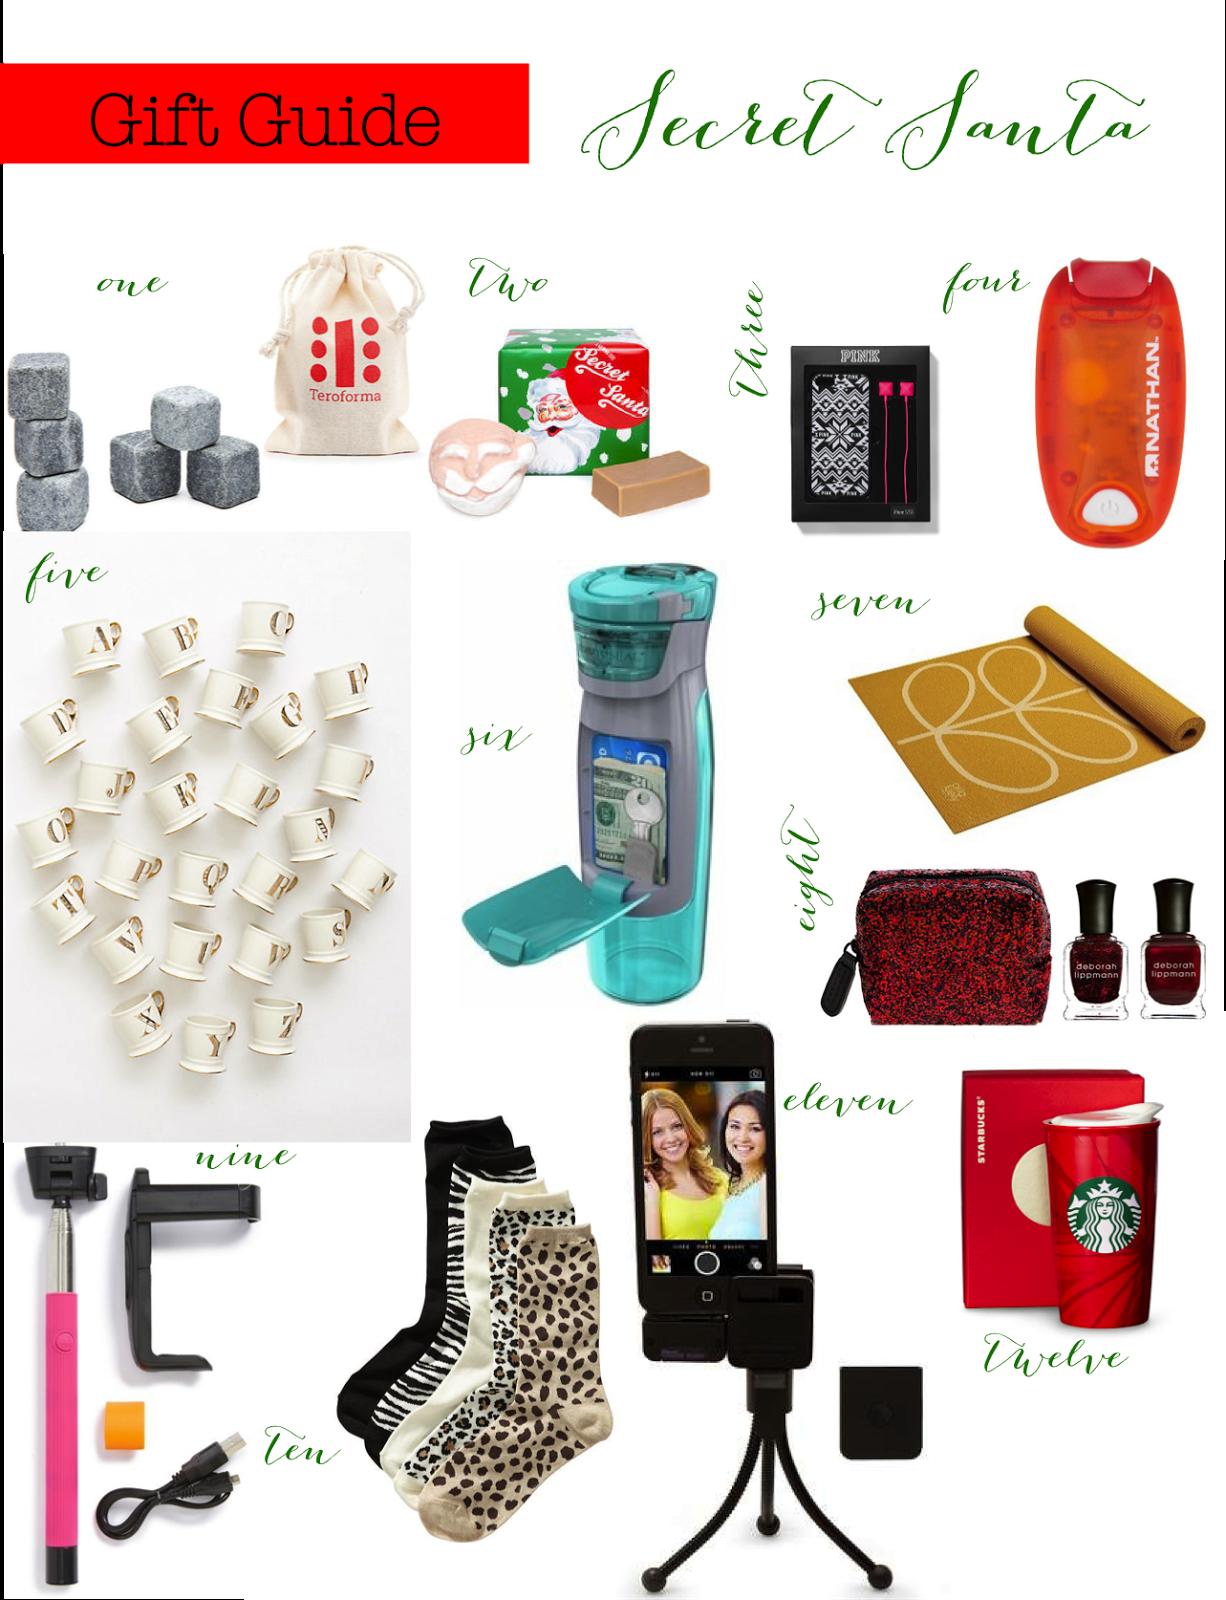 moody girl in style ready set gift for secret santa. Black Bedroom Furniture Sets. Home Design Ideas